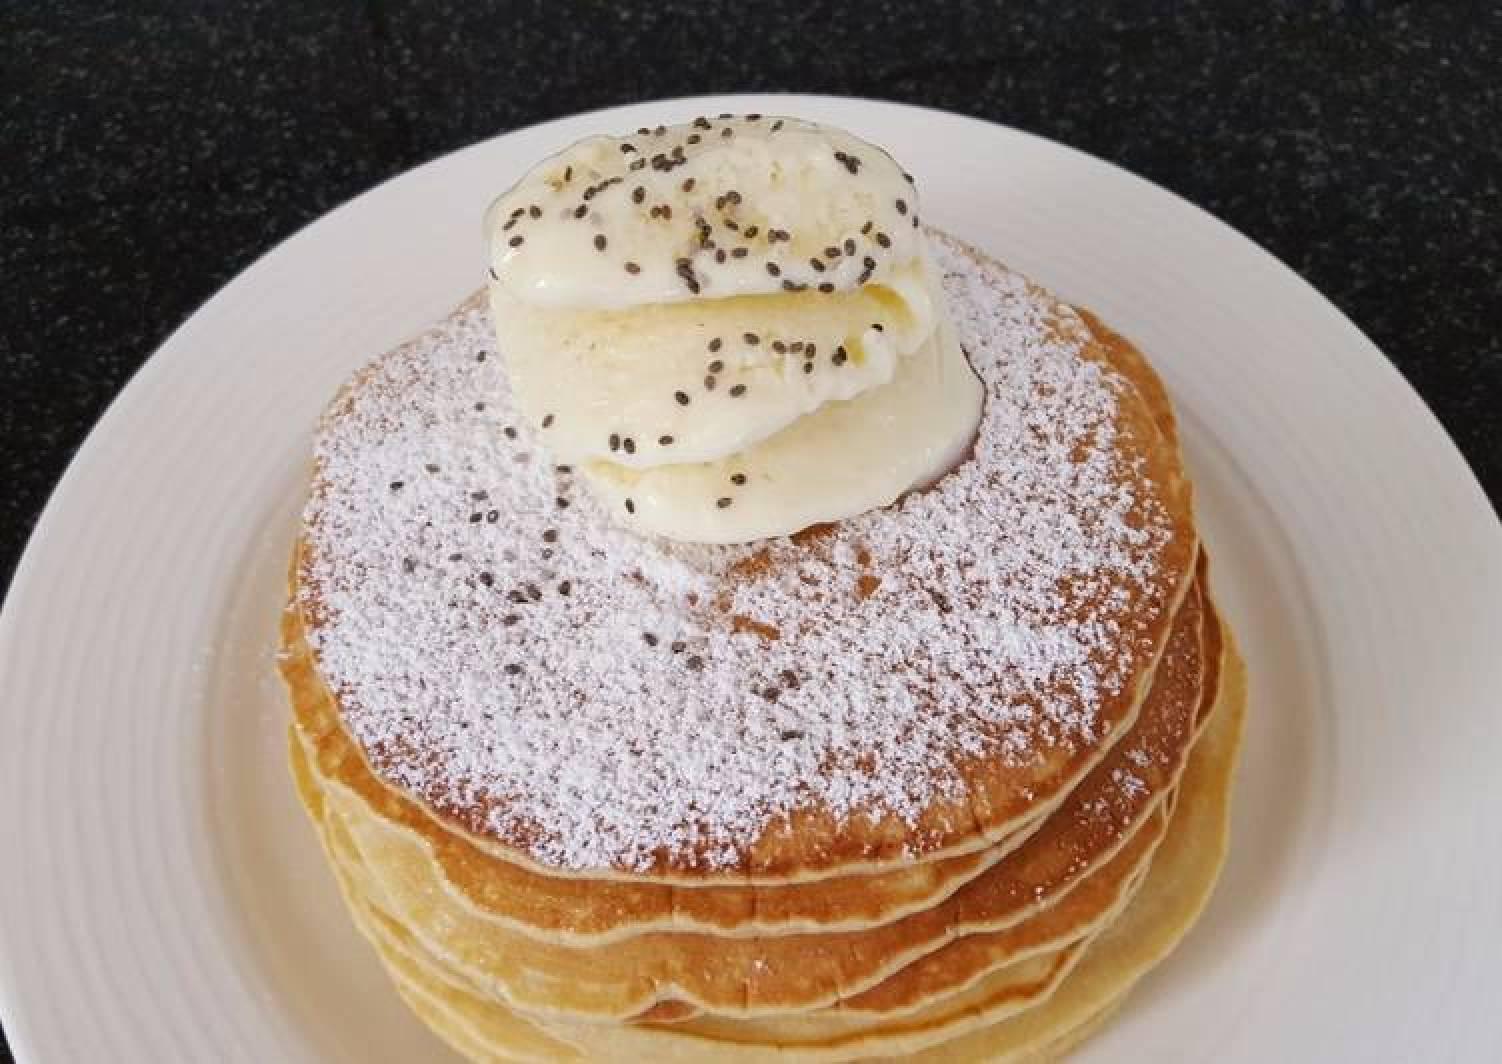 Pancakes with homemade ice cream